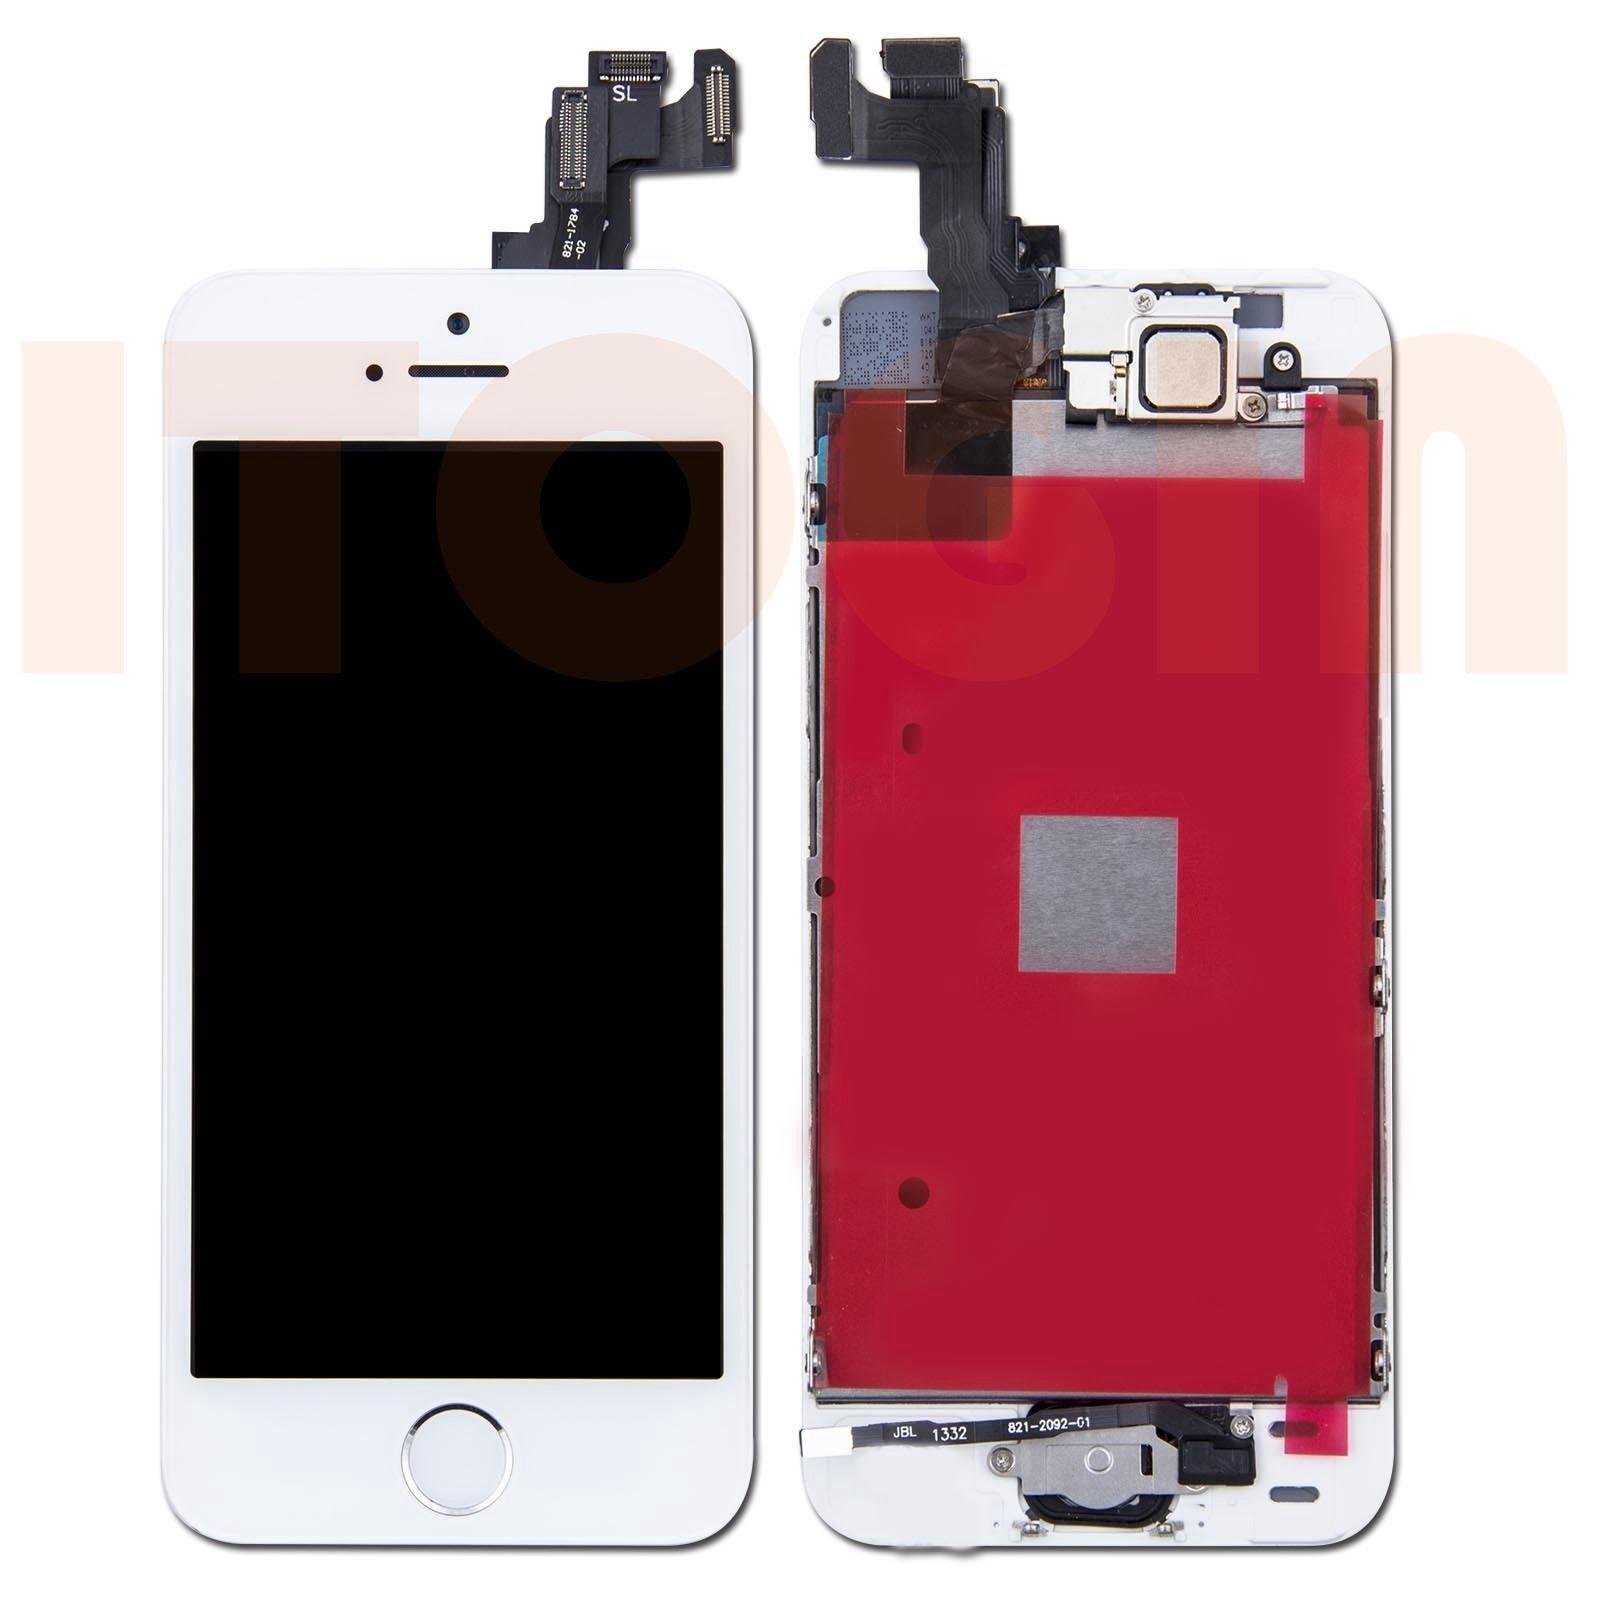 display einheit f r iphone 5se mit retina lcd glas. Black Bedroom Furniture Sets. Home Design Ideas